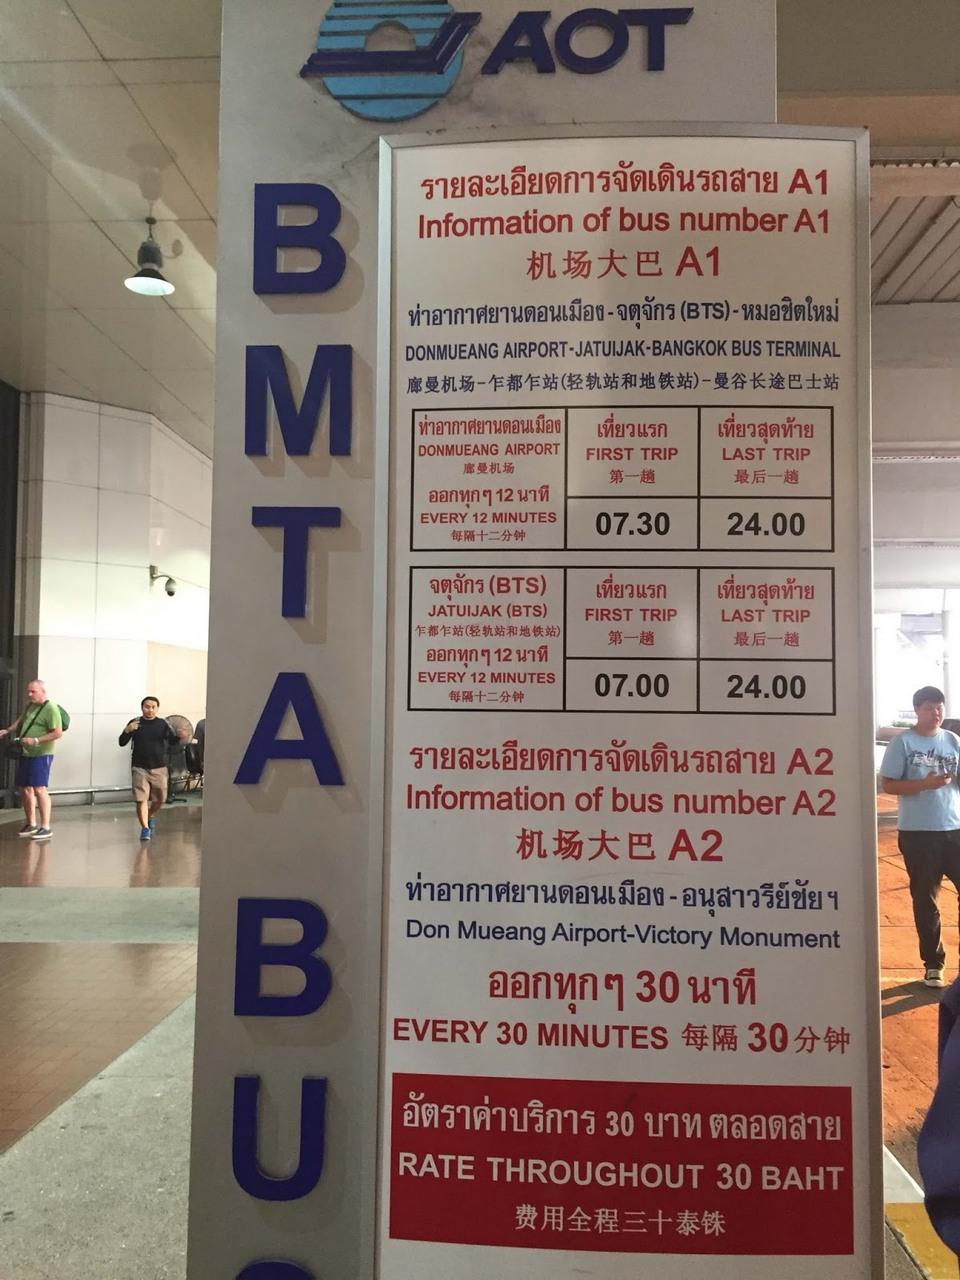 Bus A1-don muand airport to bangkok-thailand